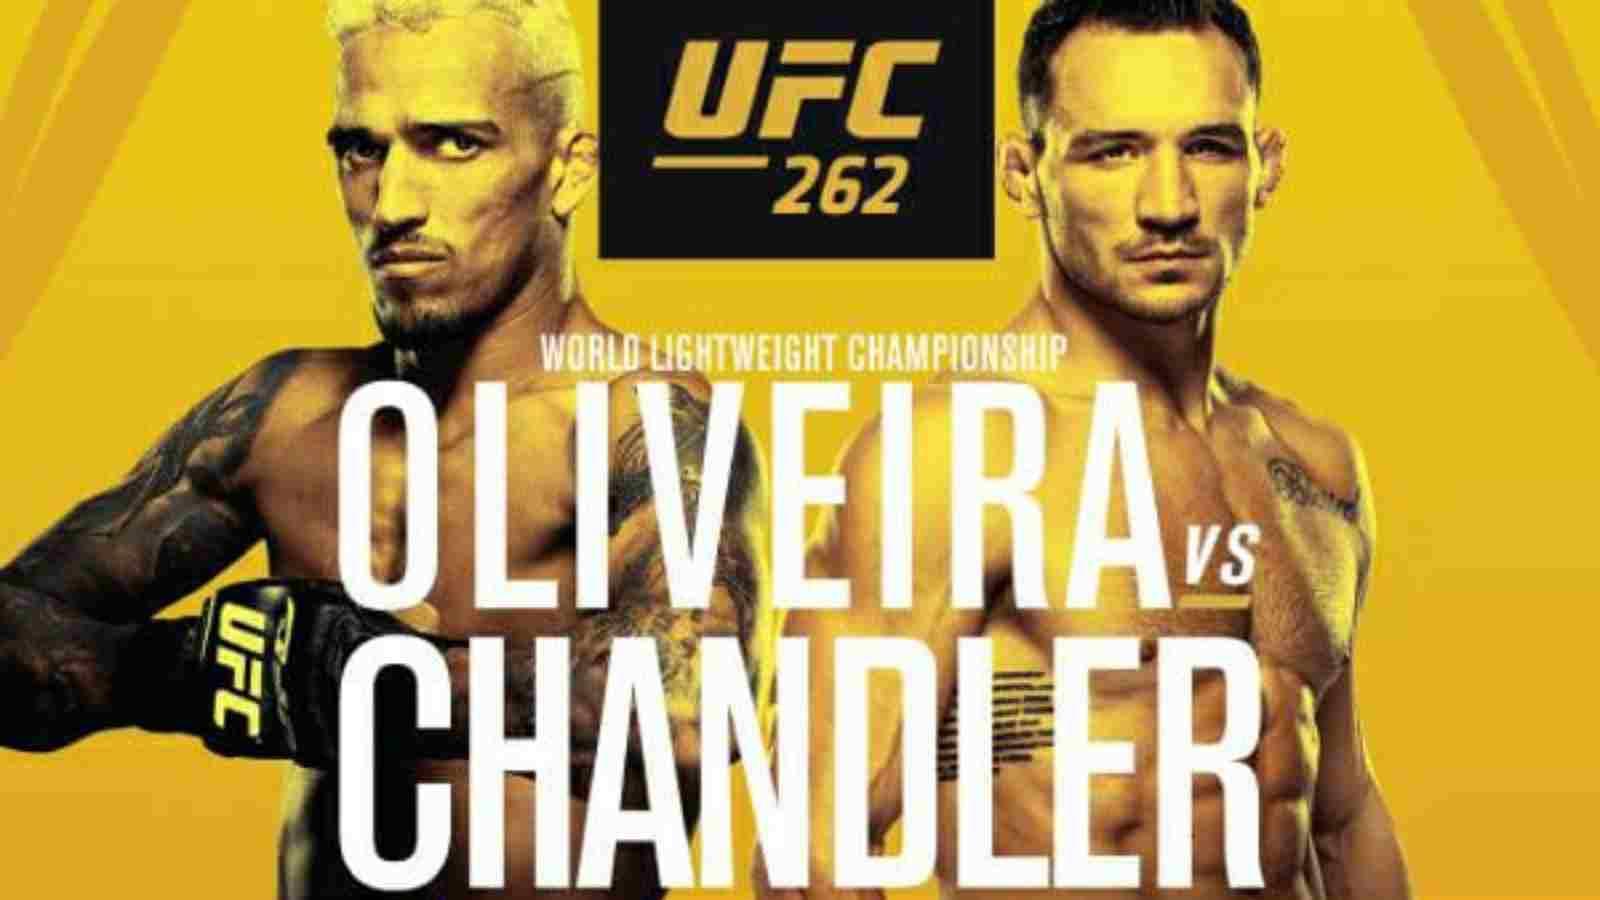 Michael Chandler vs Charles Oliveira